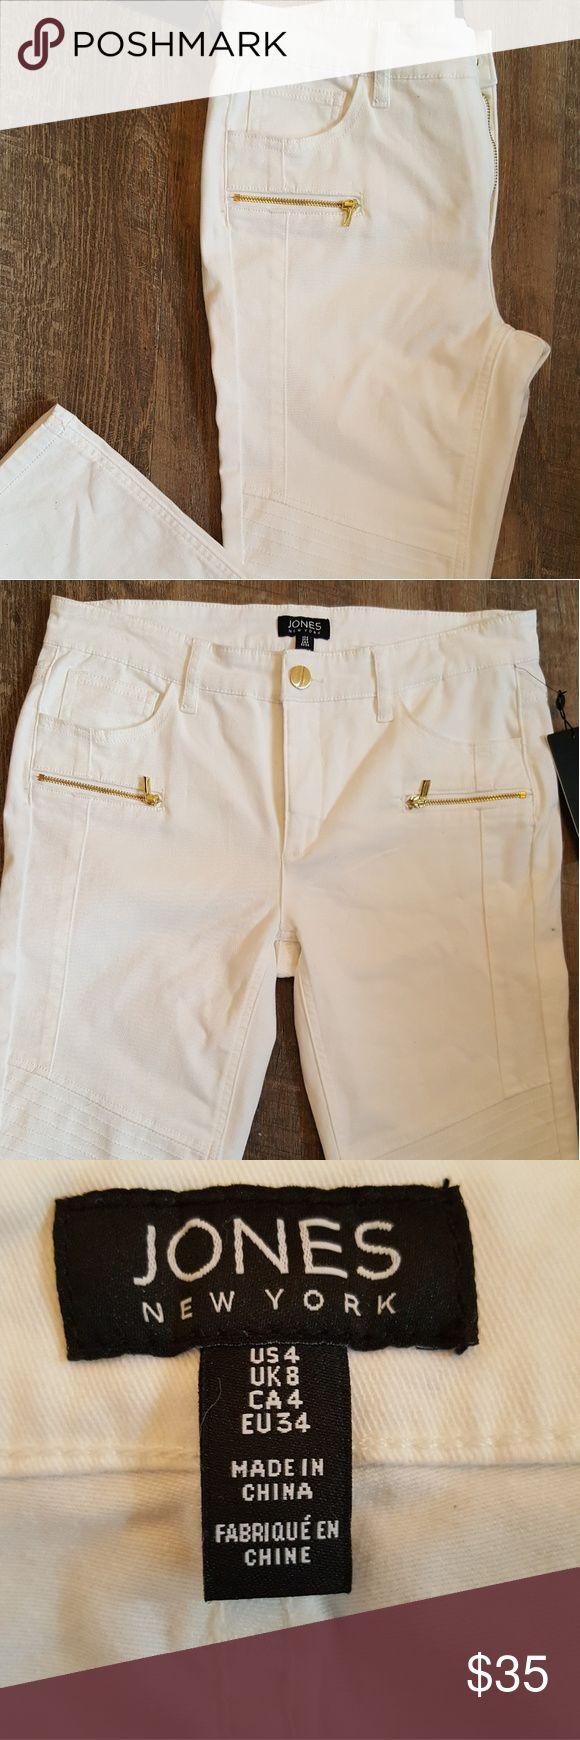 "Jones New York Moto Skinny Jeans Jones New York Moto Skinny Jeans  Size: 4  Color: White  Waist: 31"" approximately  Inseam: 29"" approximately  New with tags Jones New York Jeans Skinny"